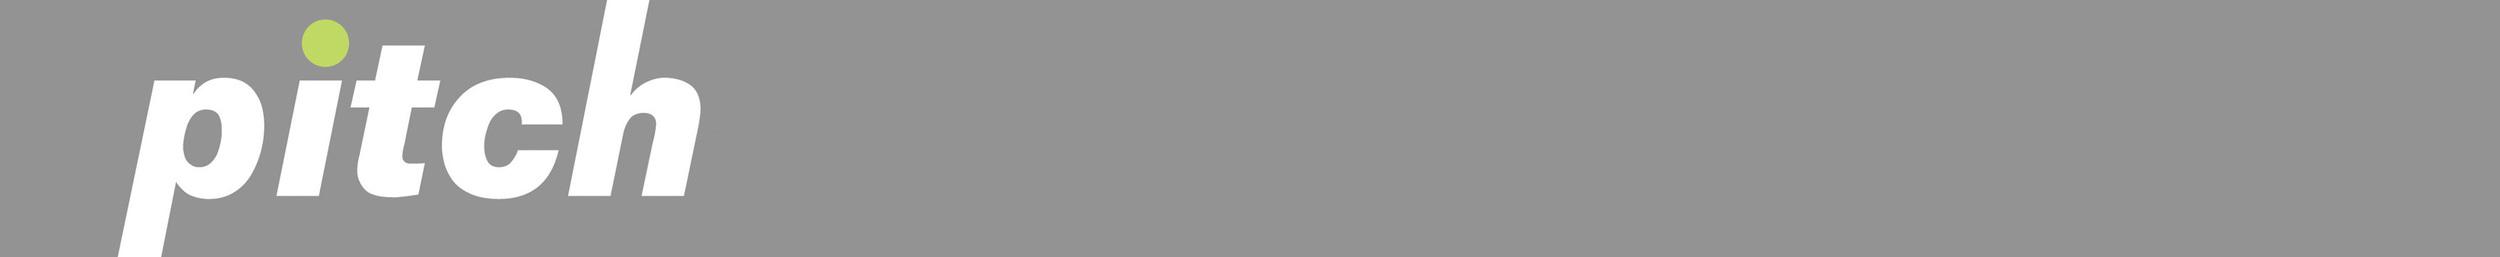 Title footer logo.jpg